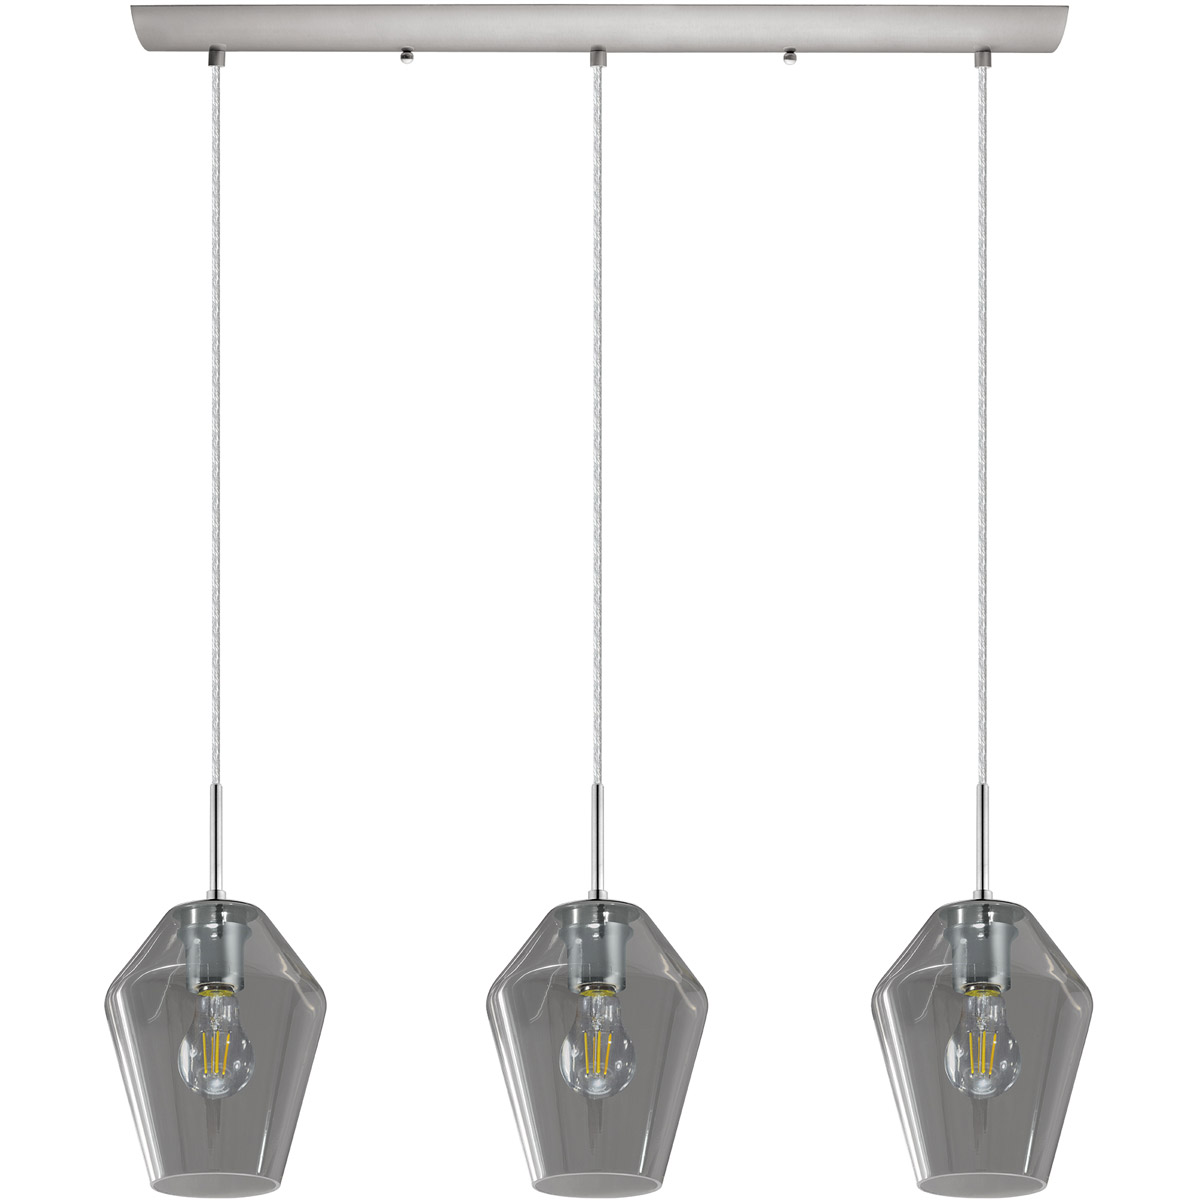 eglo pendant p ceiling light asp led linear antelao lighting